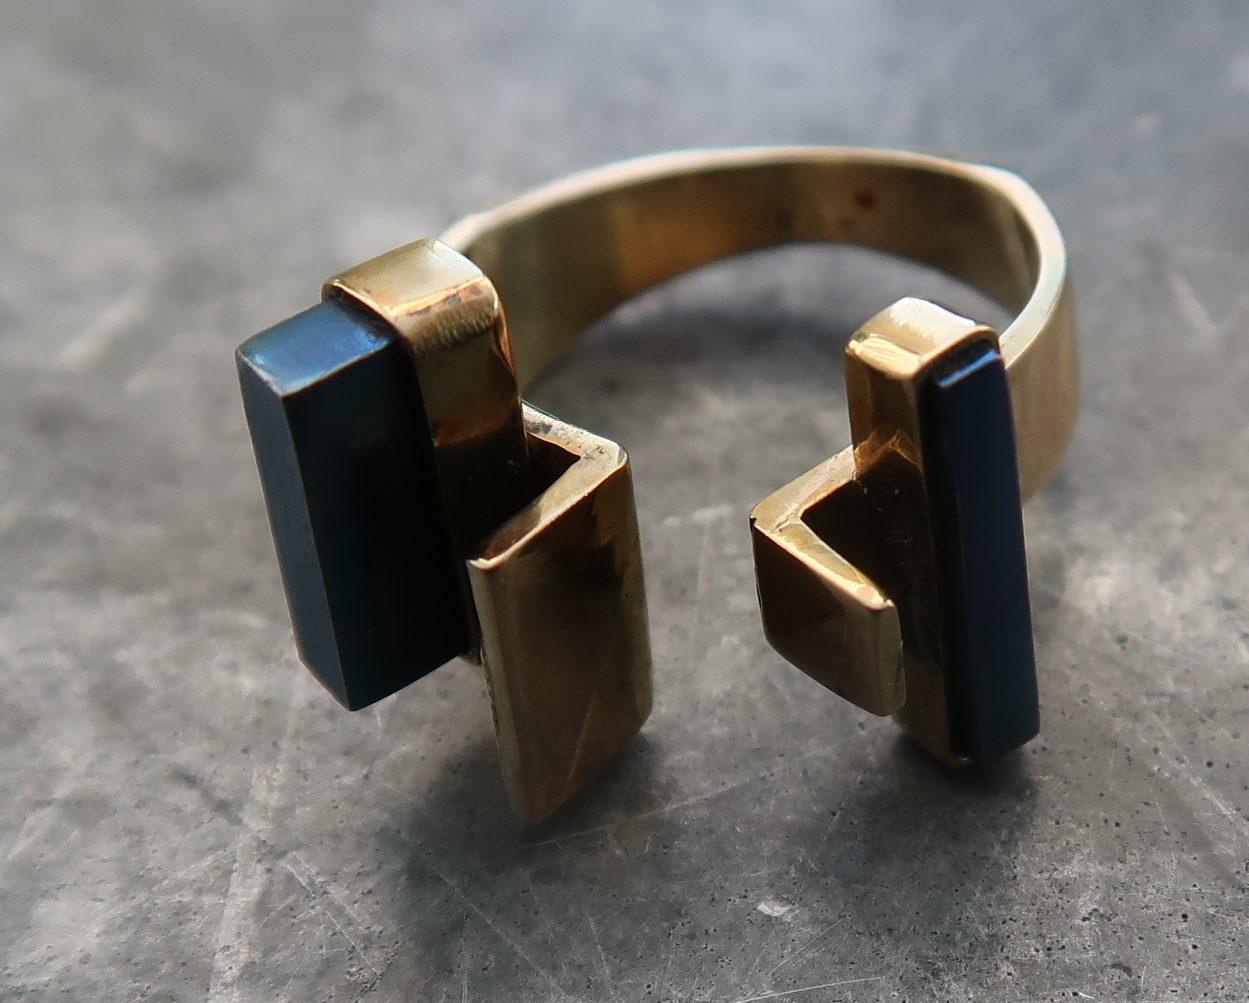 Karel Niehorster, ring, 1981. Particuliere collectie. Foto Coert Peter Krabbe, goud, titanium